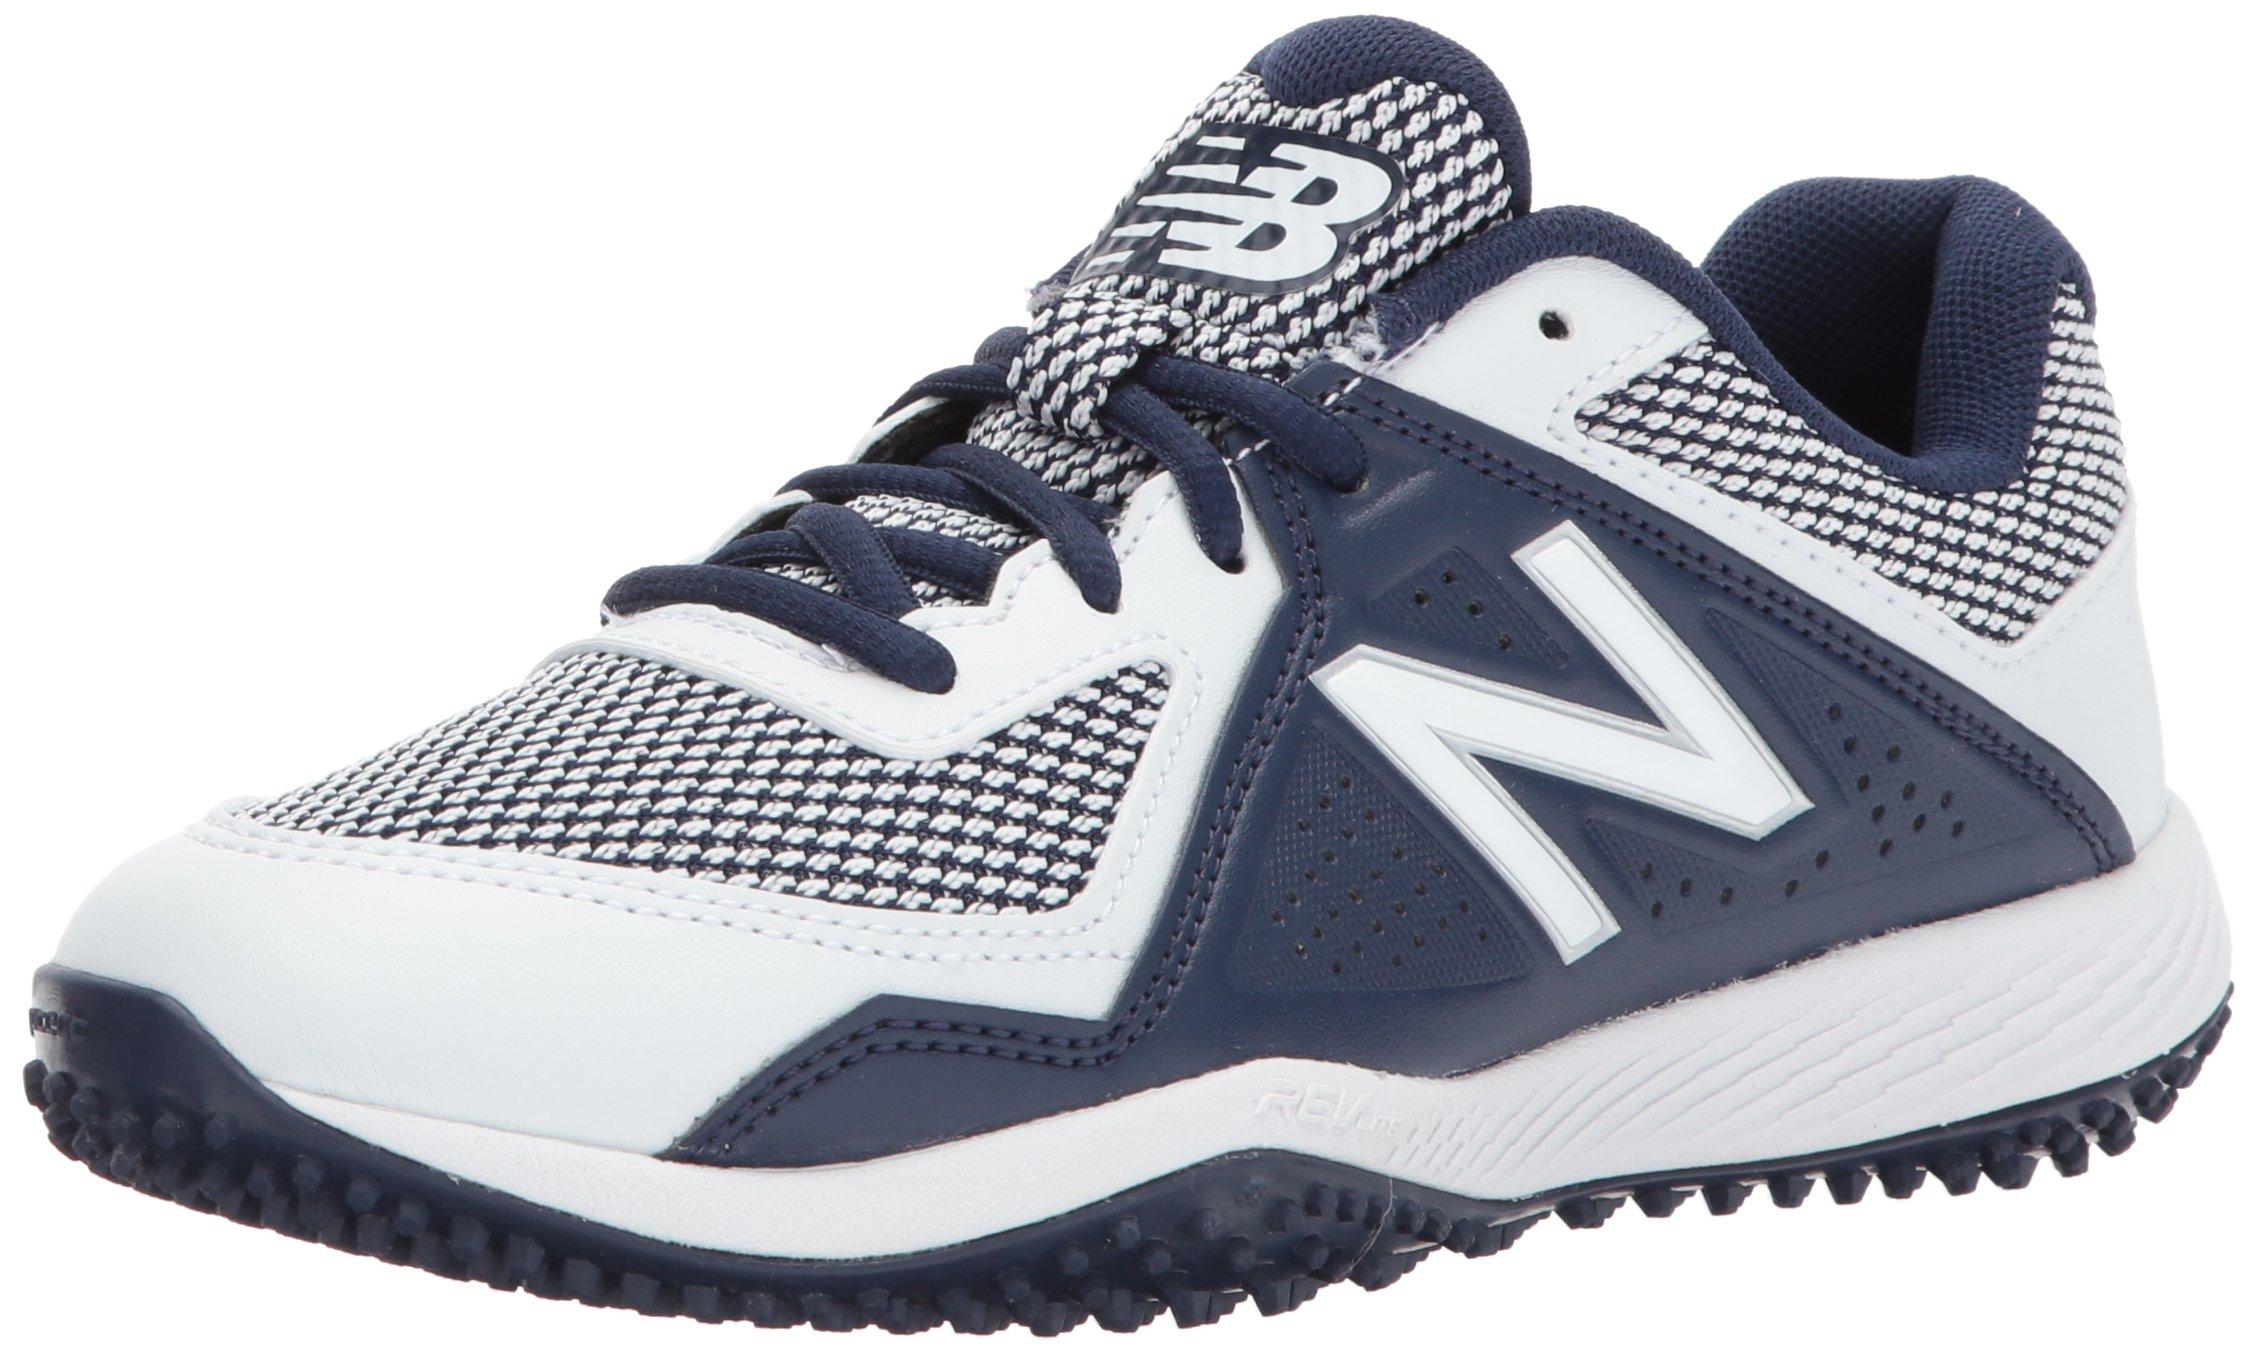 New Balance Boys' TY4040 Turf Baseball Shoe, Navy/White, 5 M US Big Kid